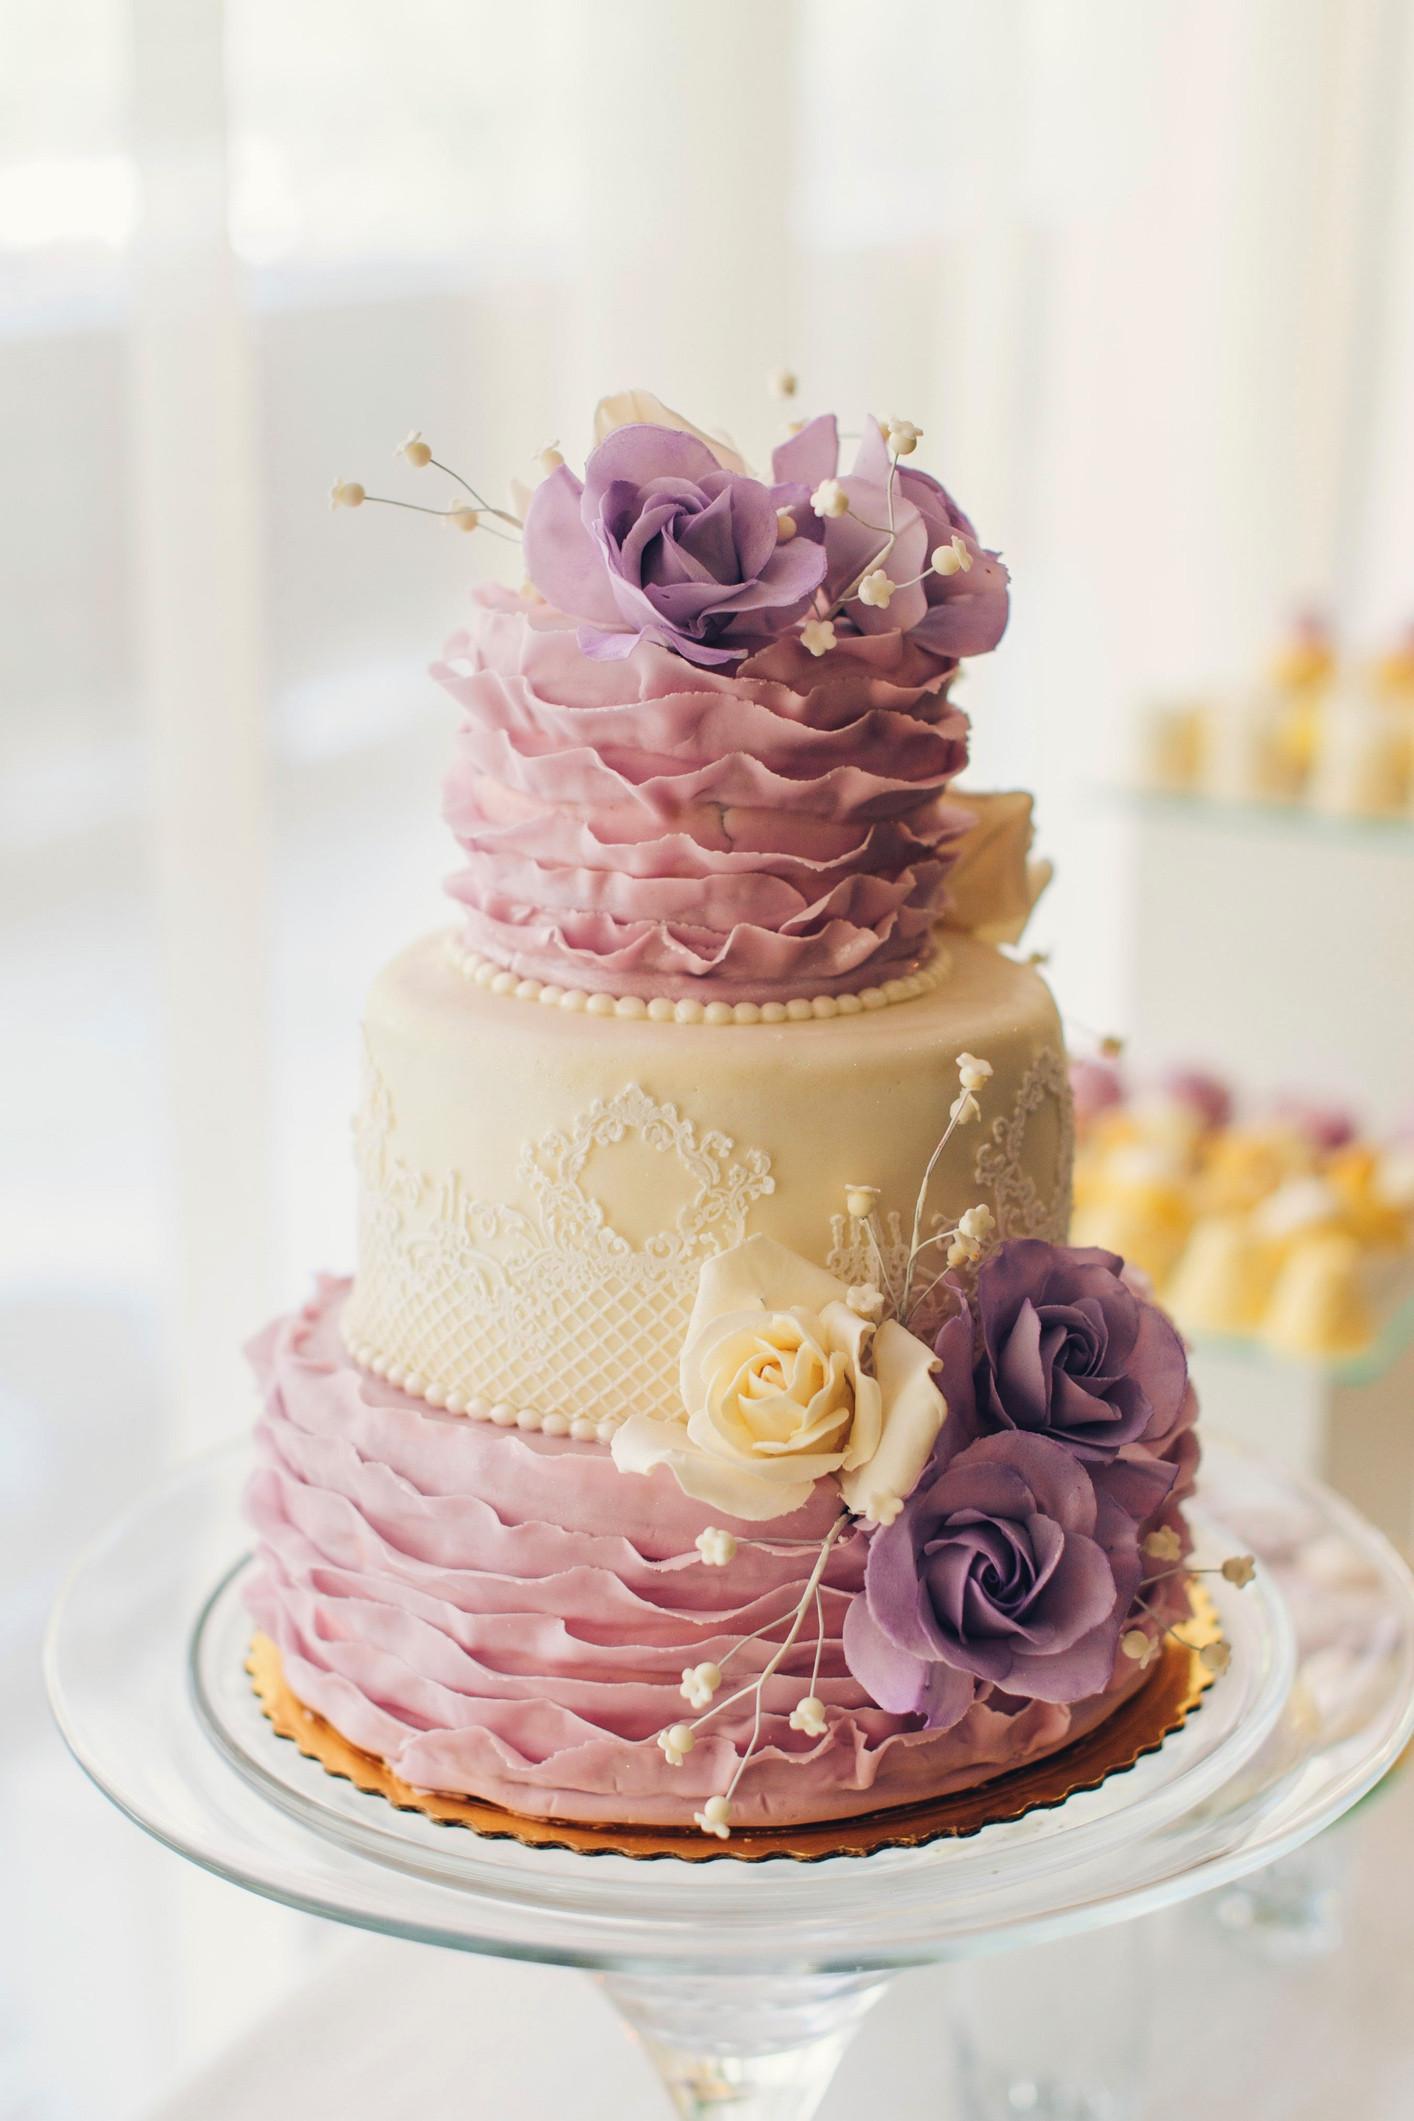 Wedding Cakes 2017  Wedding Cake Trends for 2017 Blog